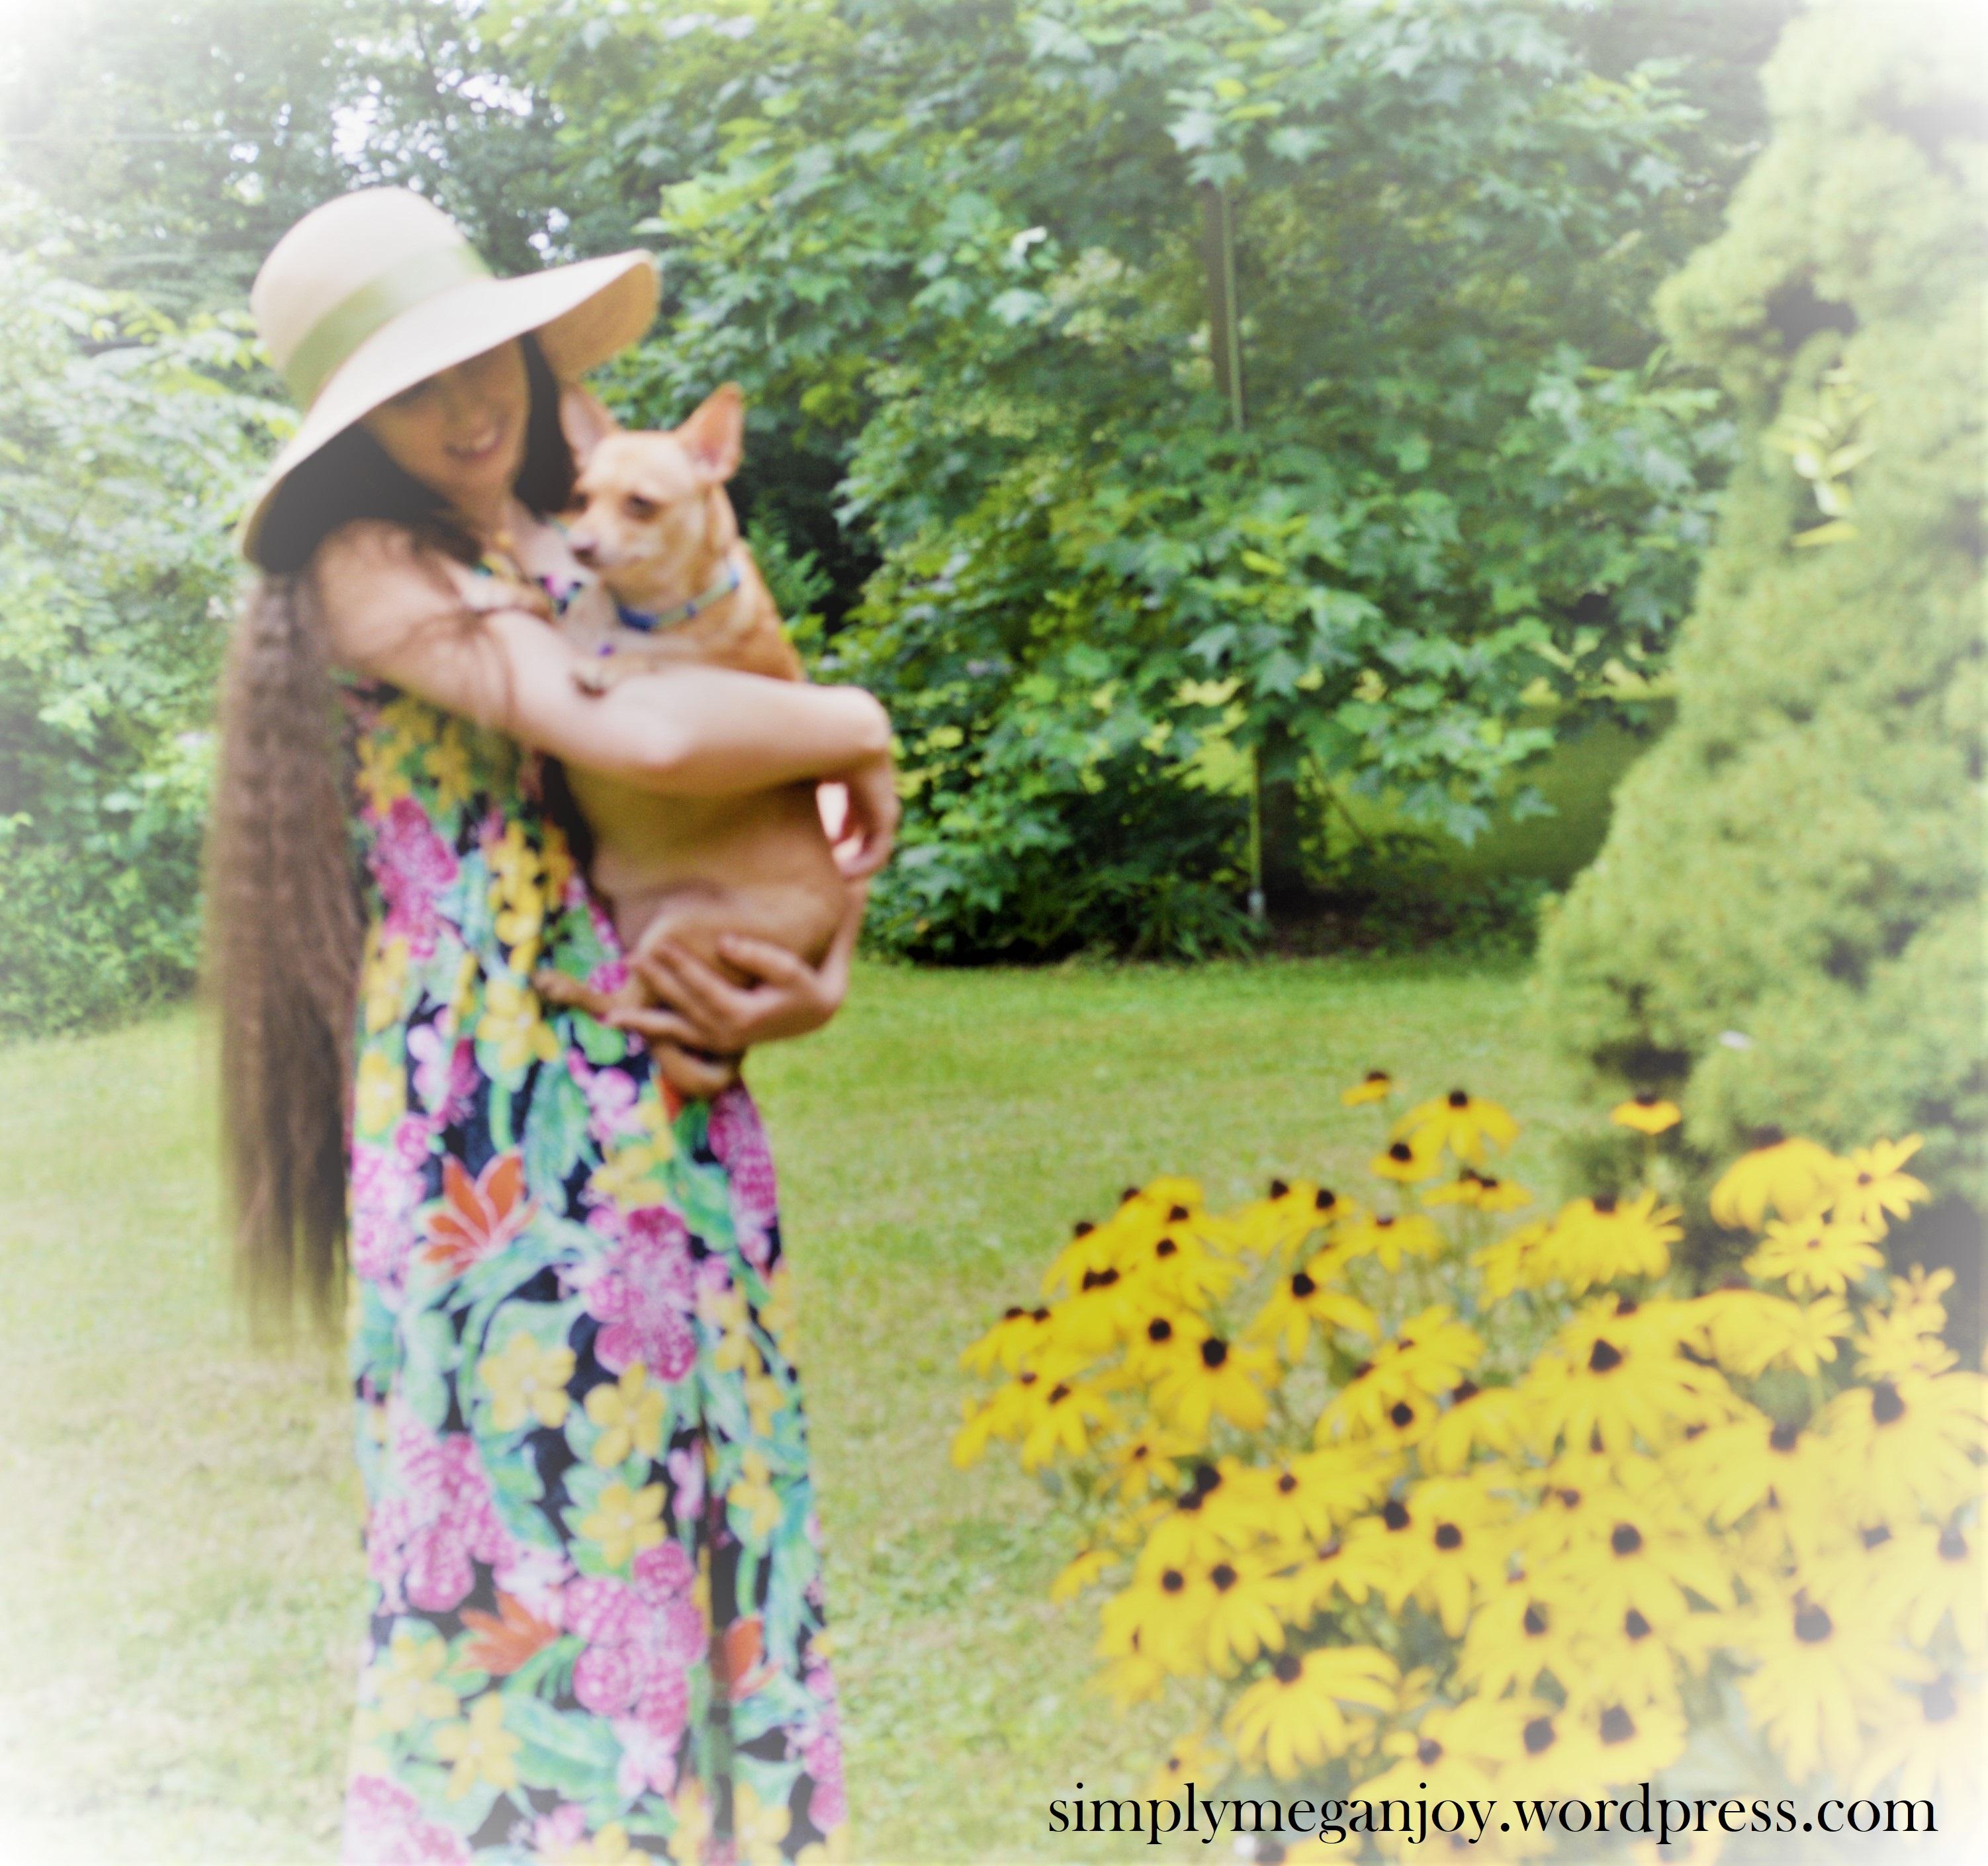 SIY (Sew It Yourself) - Gardening Dress simplymeganjoy.wordpress.com 1